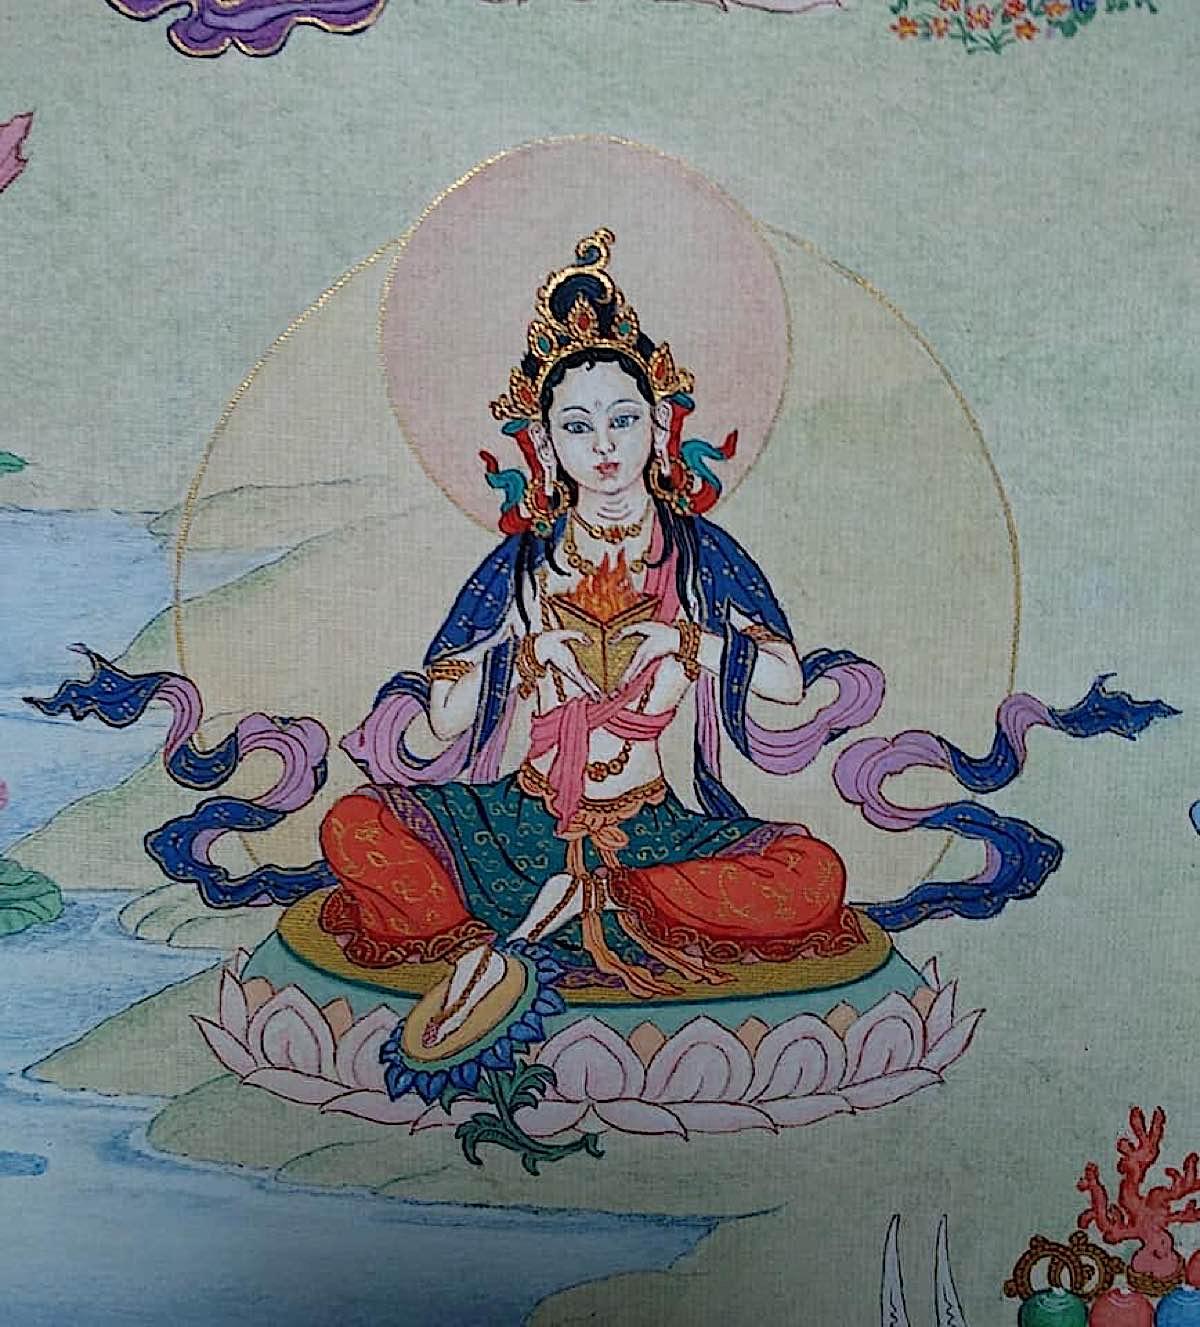 Buddha Weekly 19 Tara Consumer of All Suffering Dukha Dahana Tara 21 Taras Thankha by Angeli Lhadripa Shkonda Buddhism